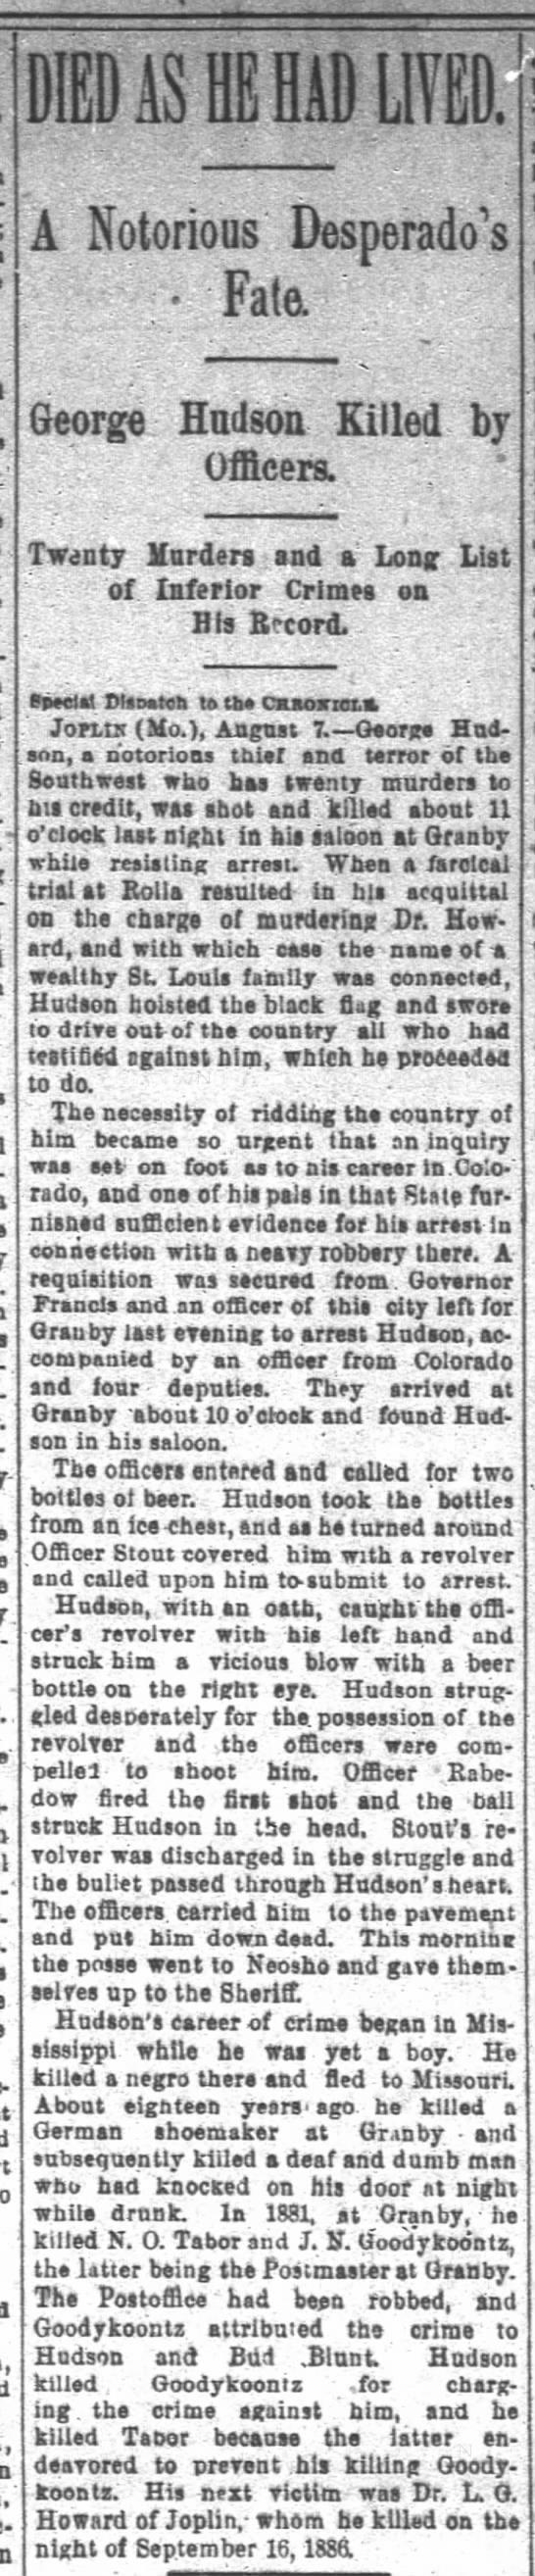 San Francisco Chronicle, San Francisco, CA, 8 Aug 1892,  -